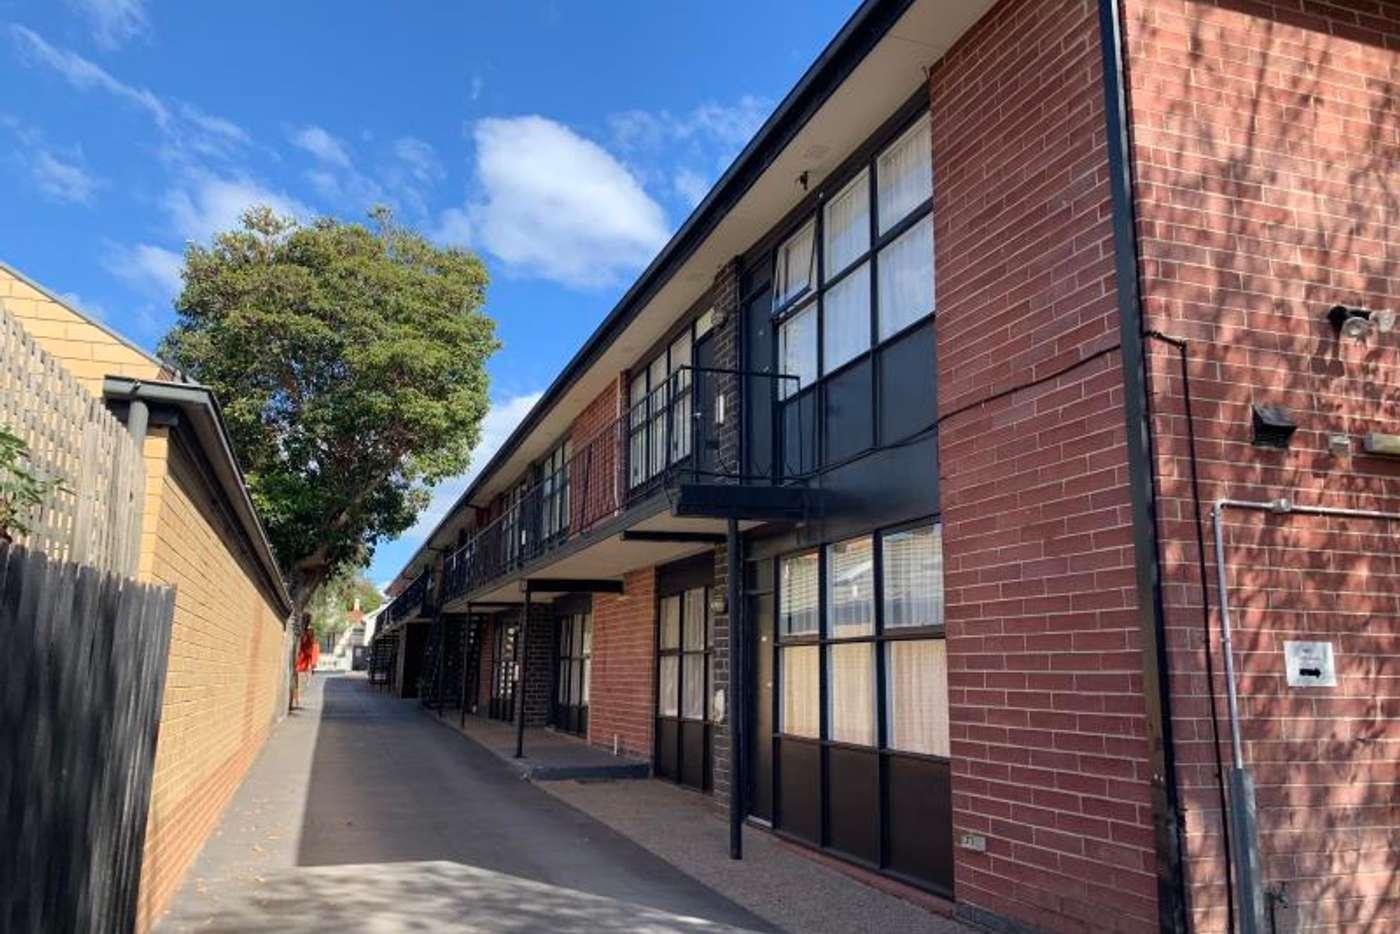 Main view of Homely studio listing, 512/62 Carlisle Street, St Kilda VIC 3182